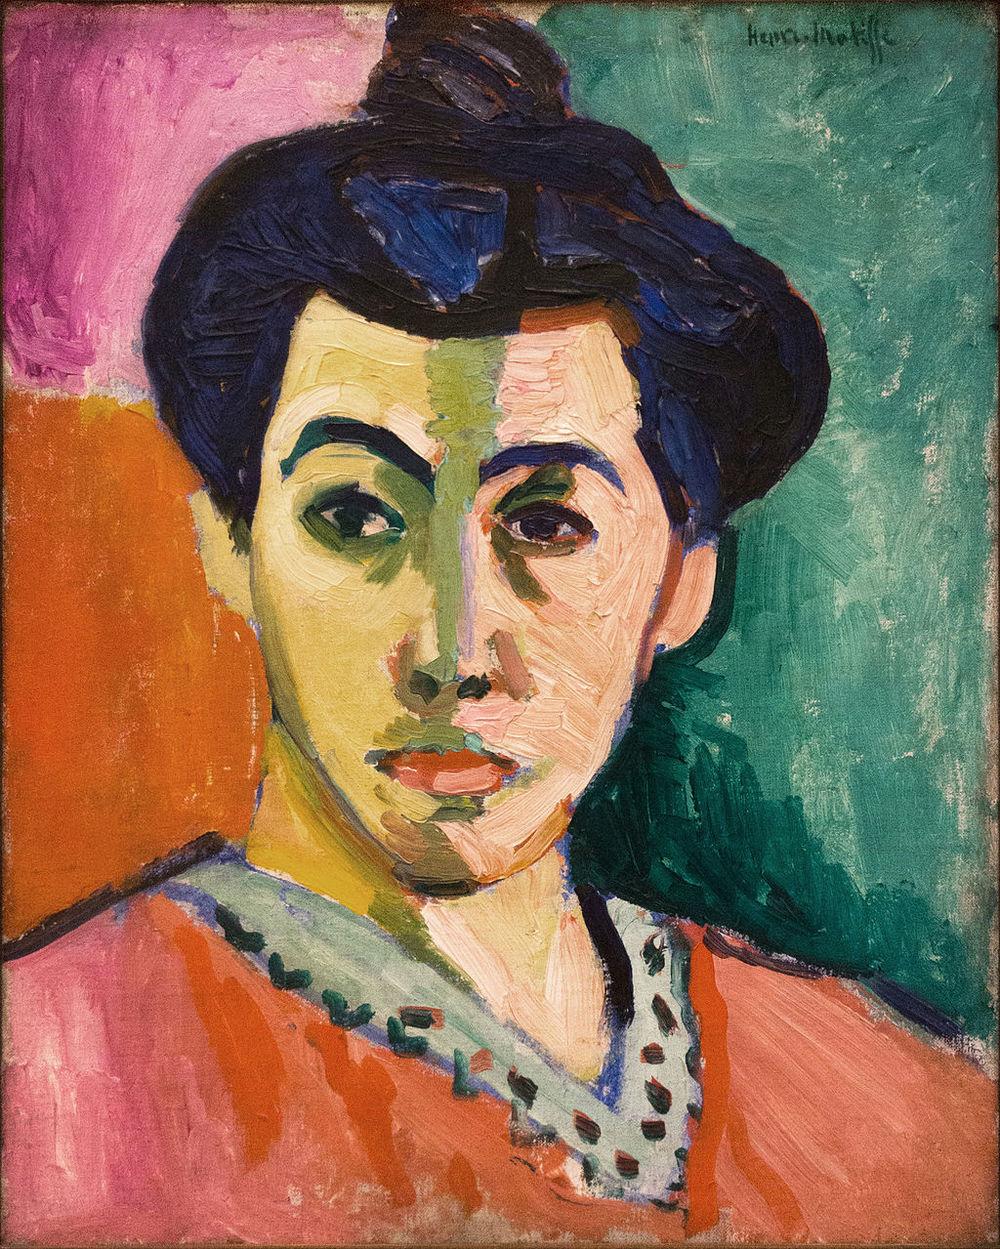 Henri Matisse,  Portrait of Madame Matisse. The Green Line , 1905, Statens Museum for Kunst, Copenhagen.